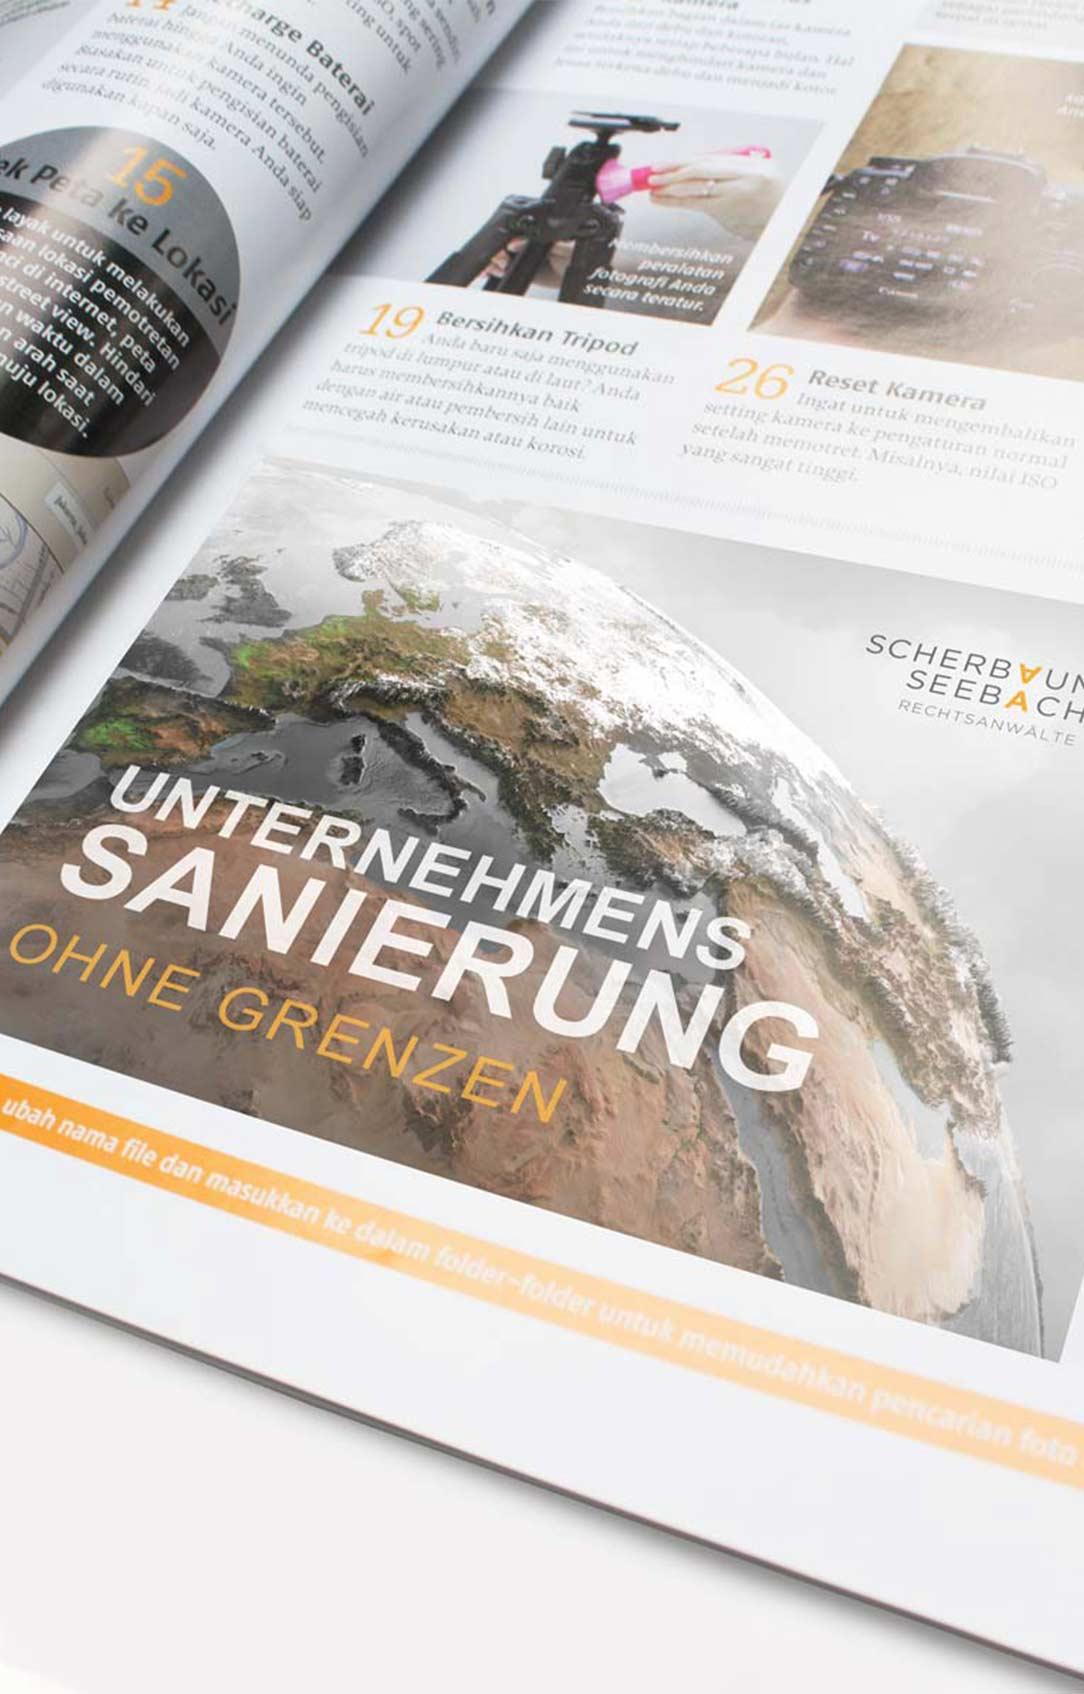 True-Creative-Agency-ScherbaumSeebacher-Legal-Werbedesign-2-1